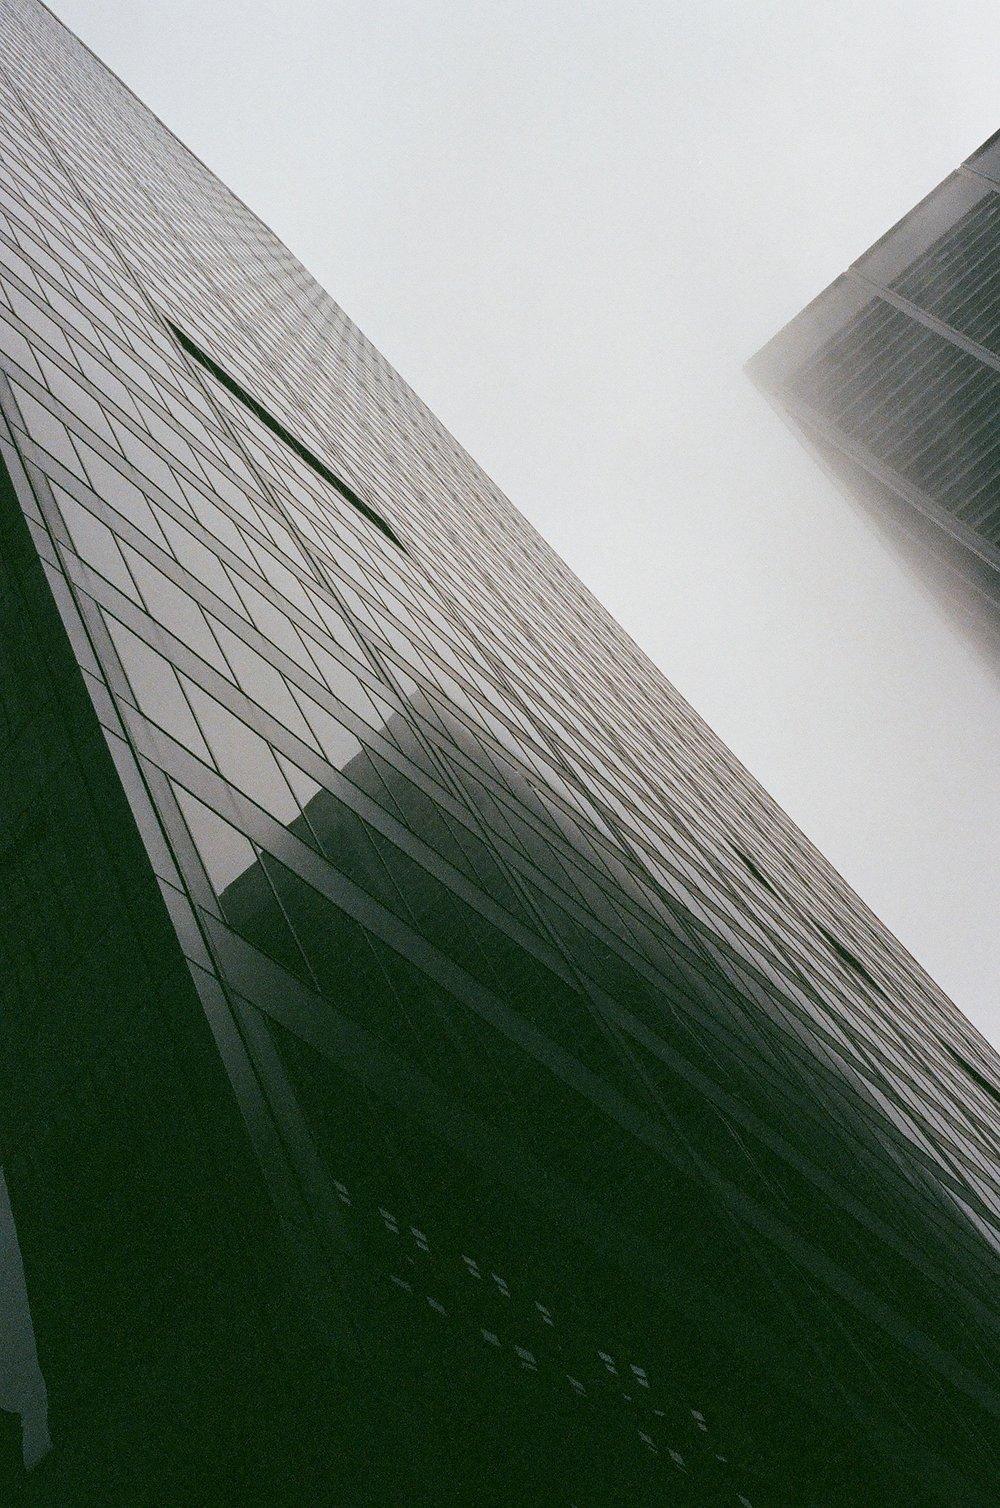 Glasscrapers, Financial District, Manhattan - 2017